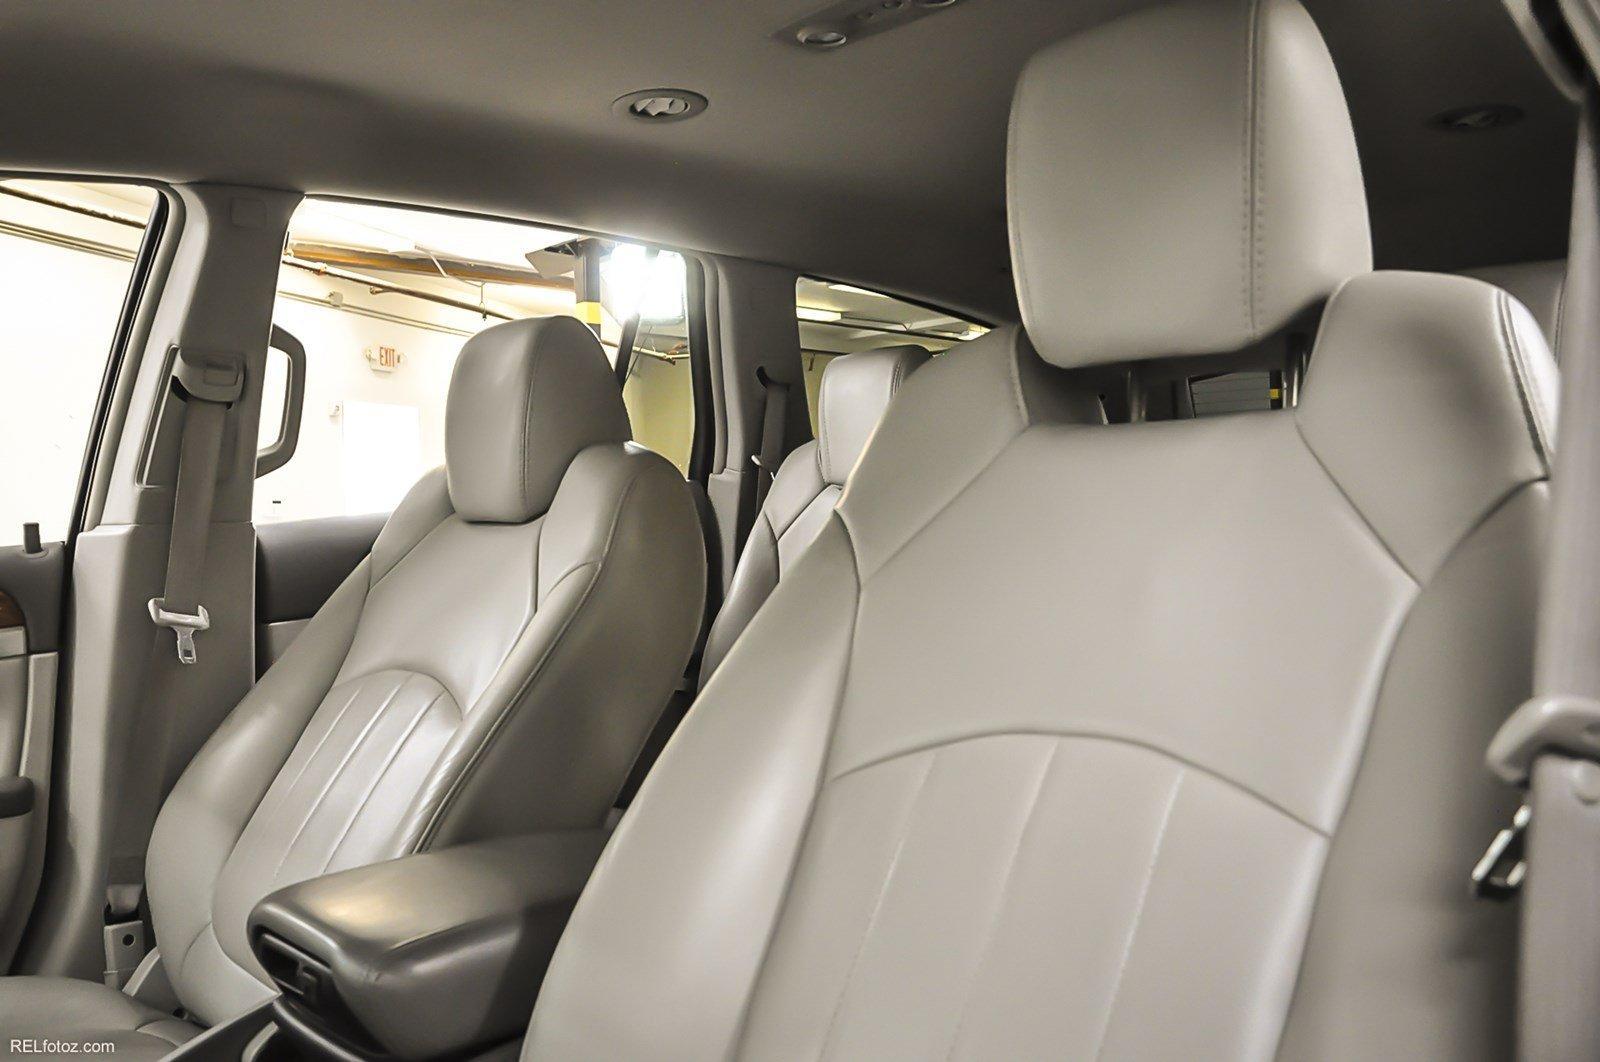 Swell 2009 Buick Enclave Cxl Stock 189712 For Sale Near Marietta Creativecarmelina Interior Chair Design Creativecarmelinacom